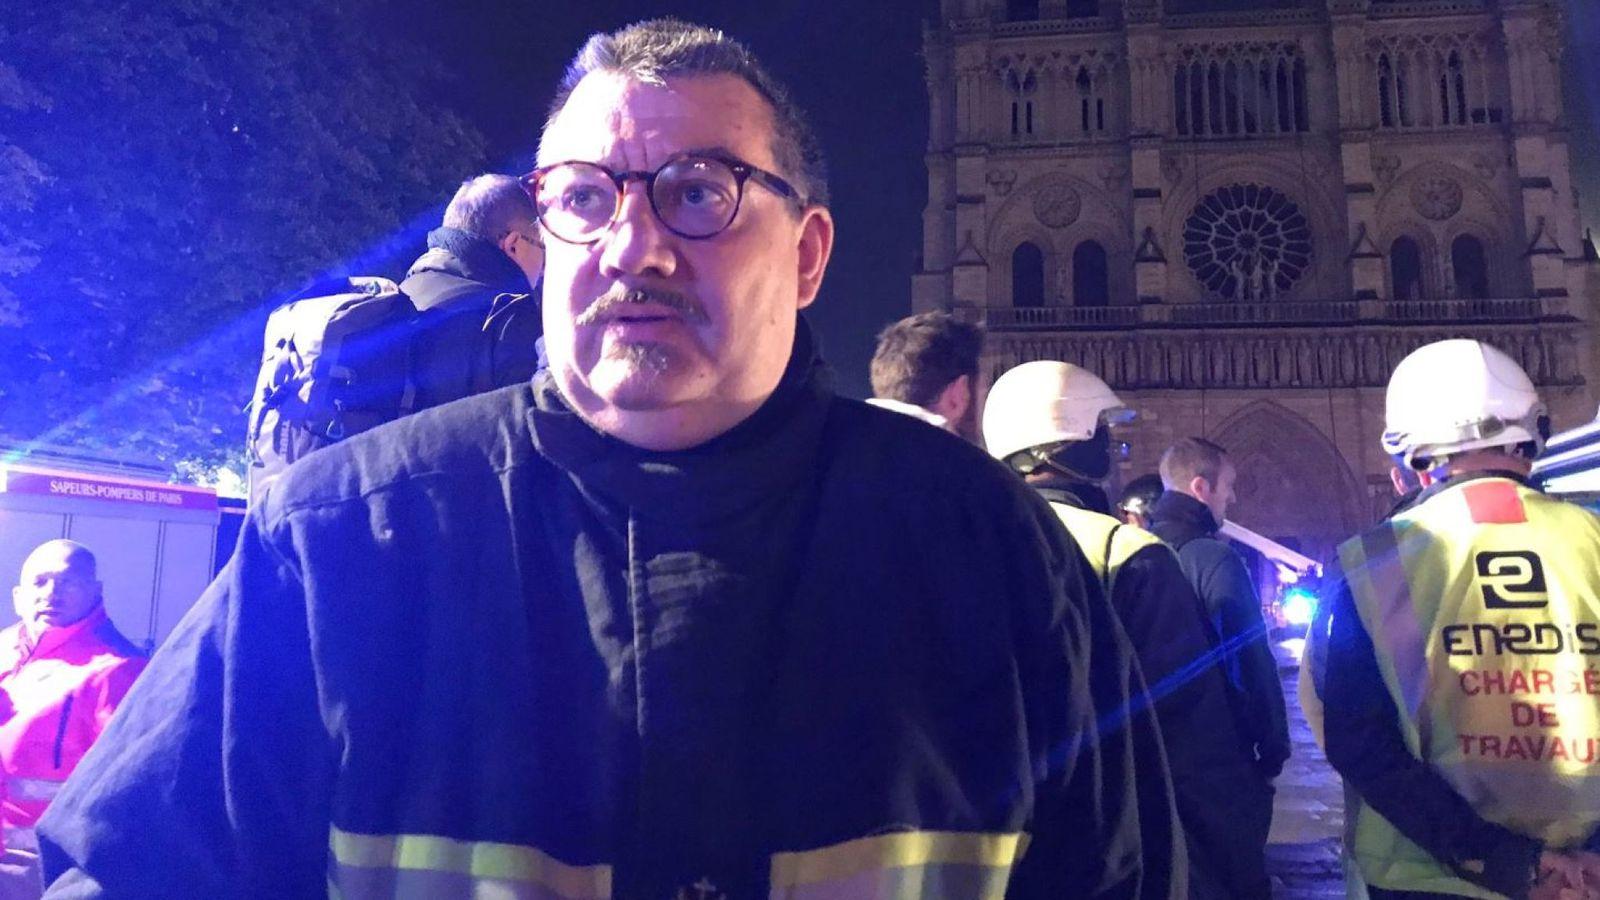 Jean-Marc Fournier has been hailed a hero